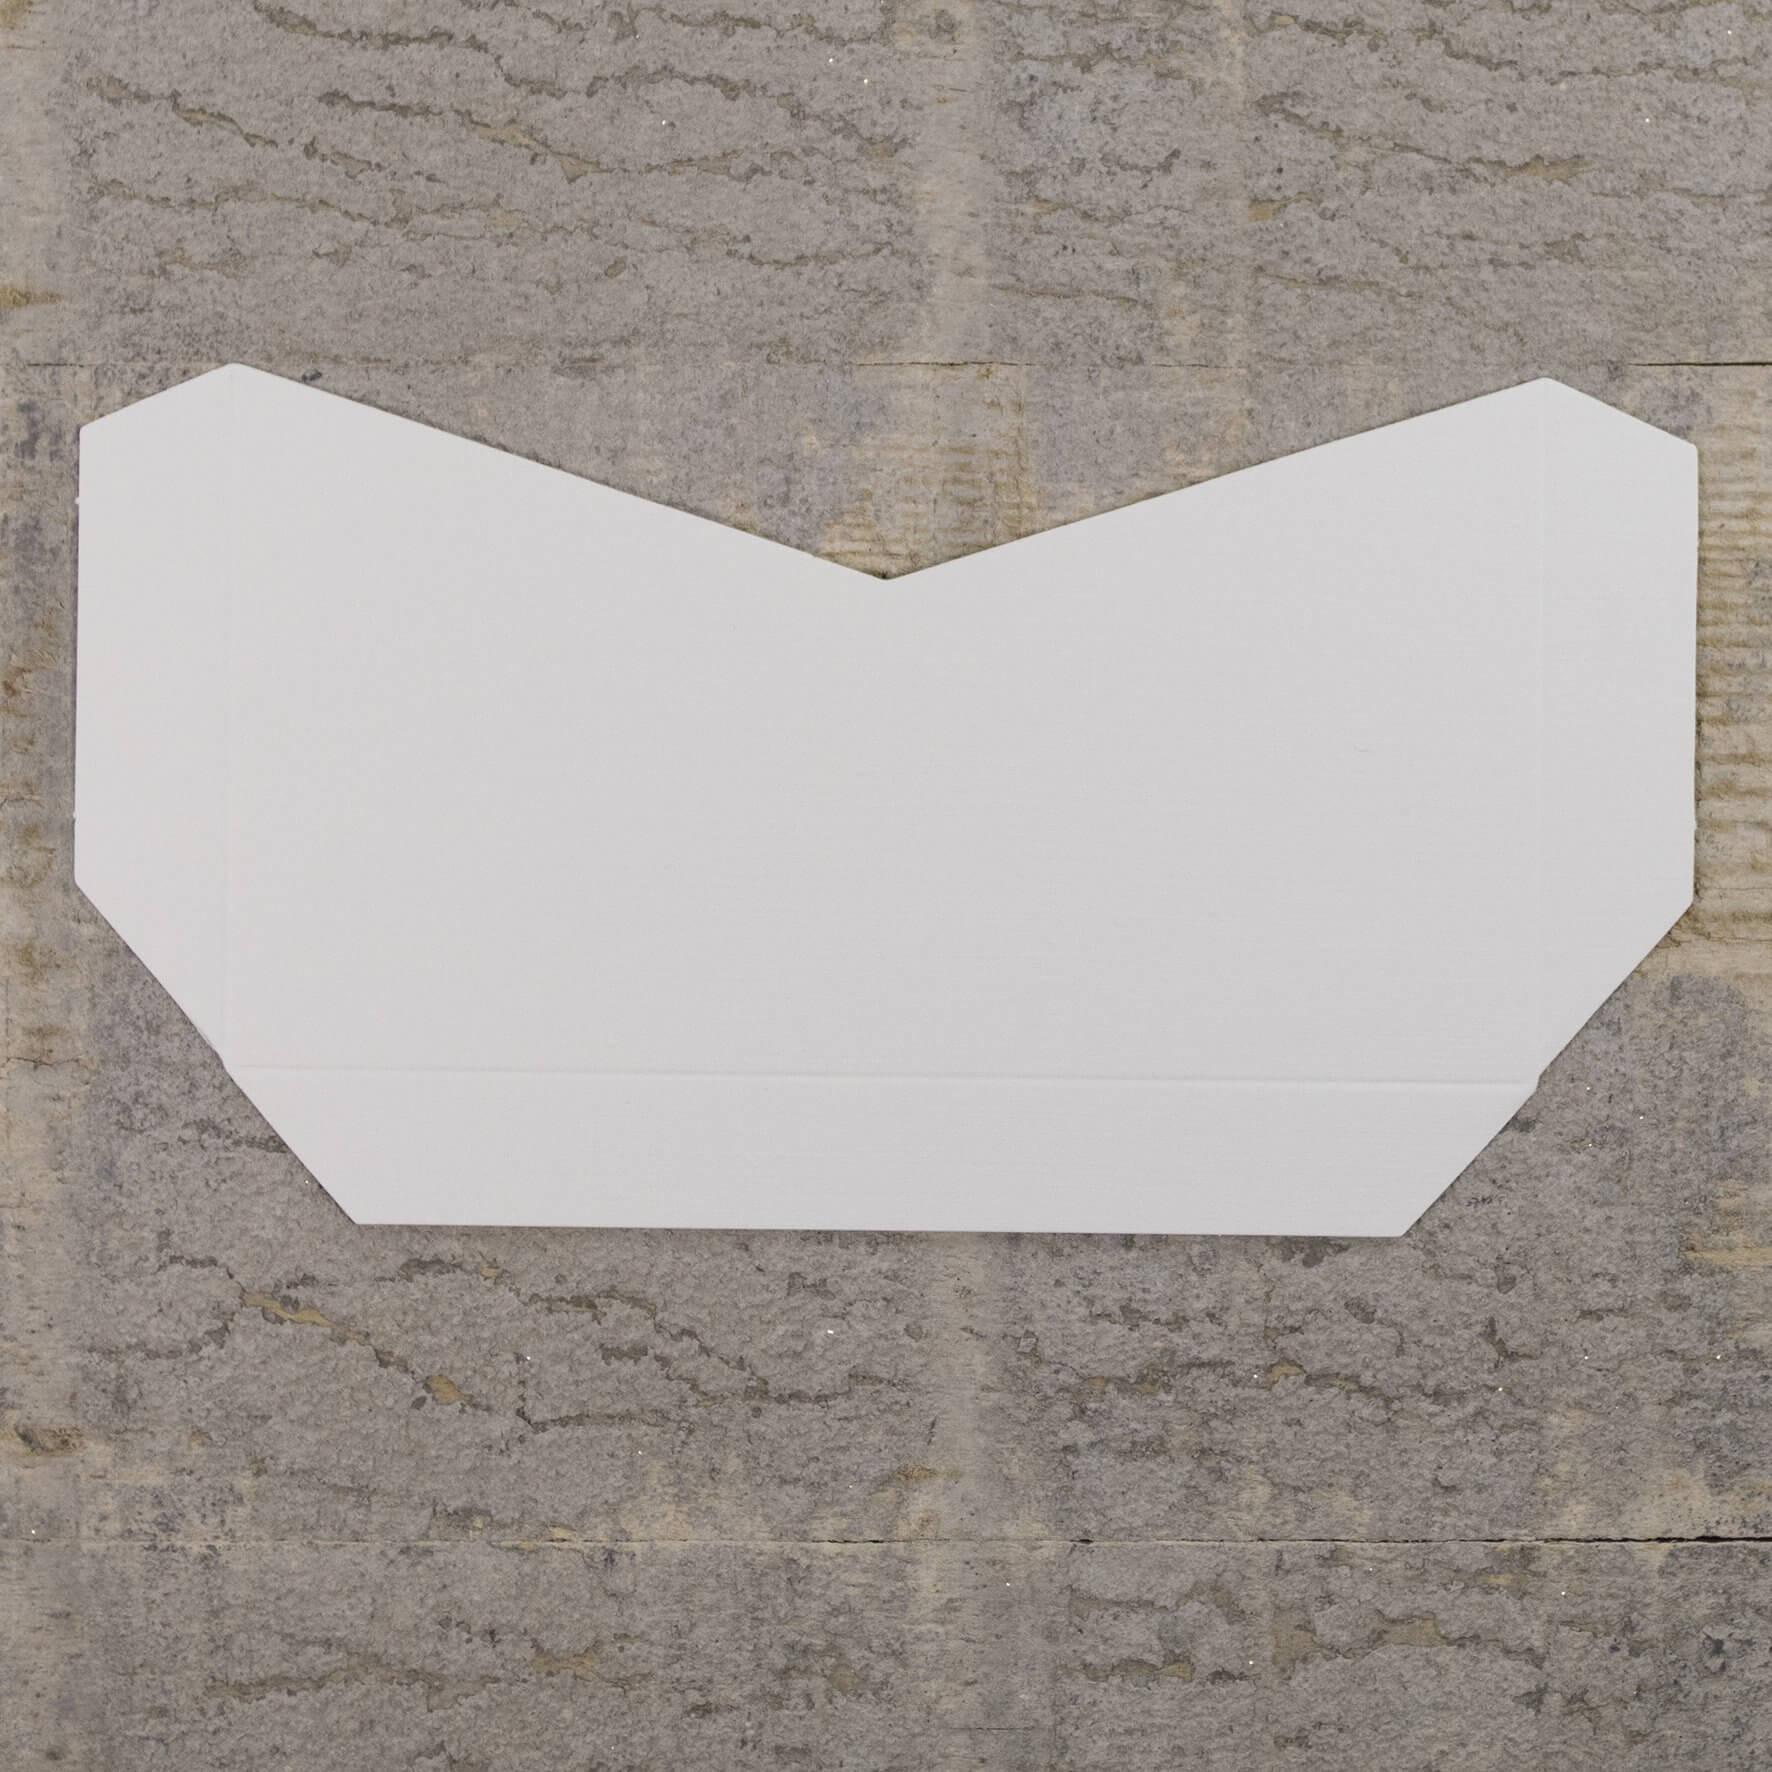 Enfolio Tentfold (Lg Sq) Add On Pocket - Silkweave Ivory